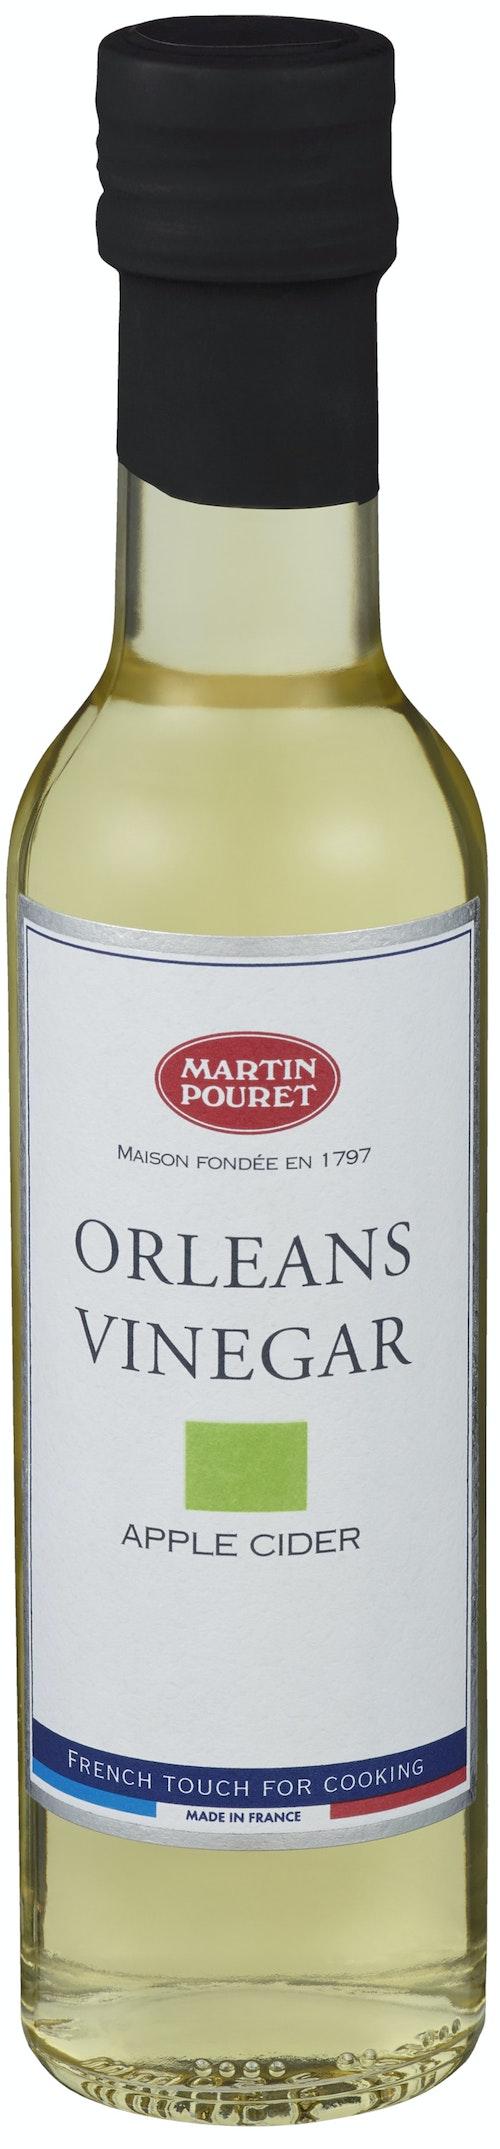 Martin Pouret Eplecidereddik 250 ml